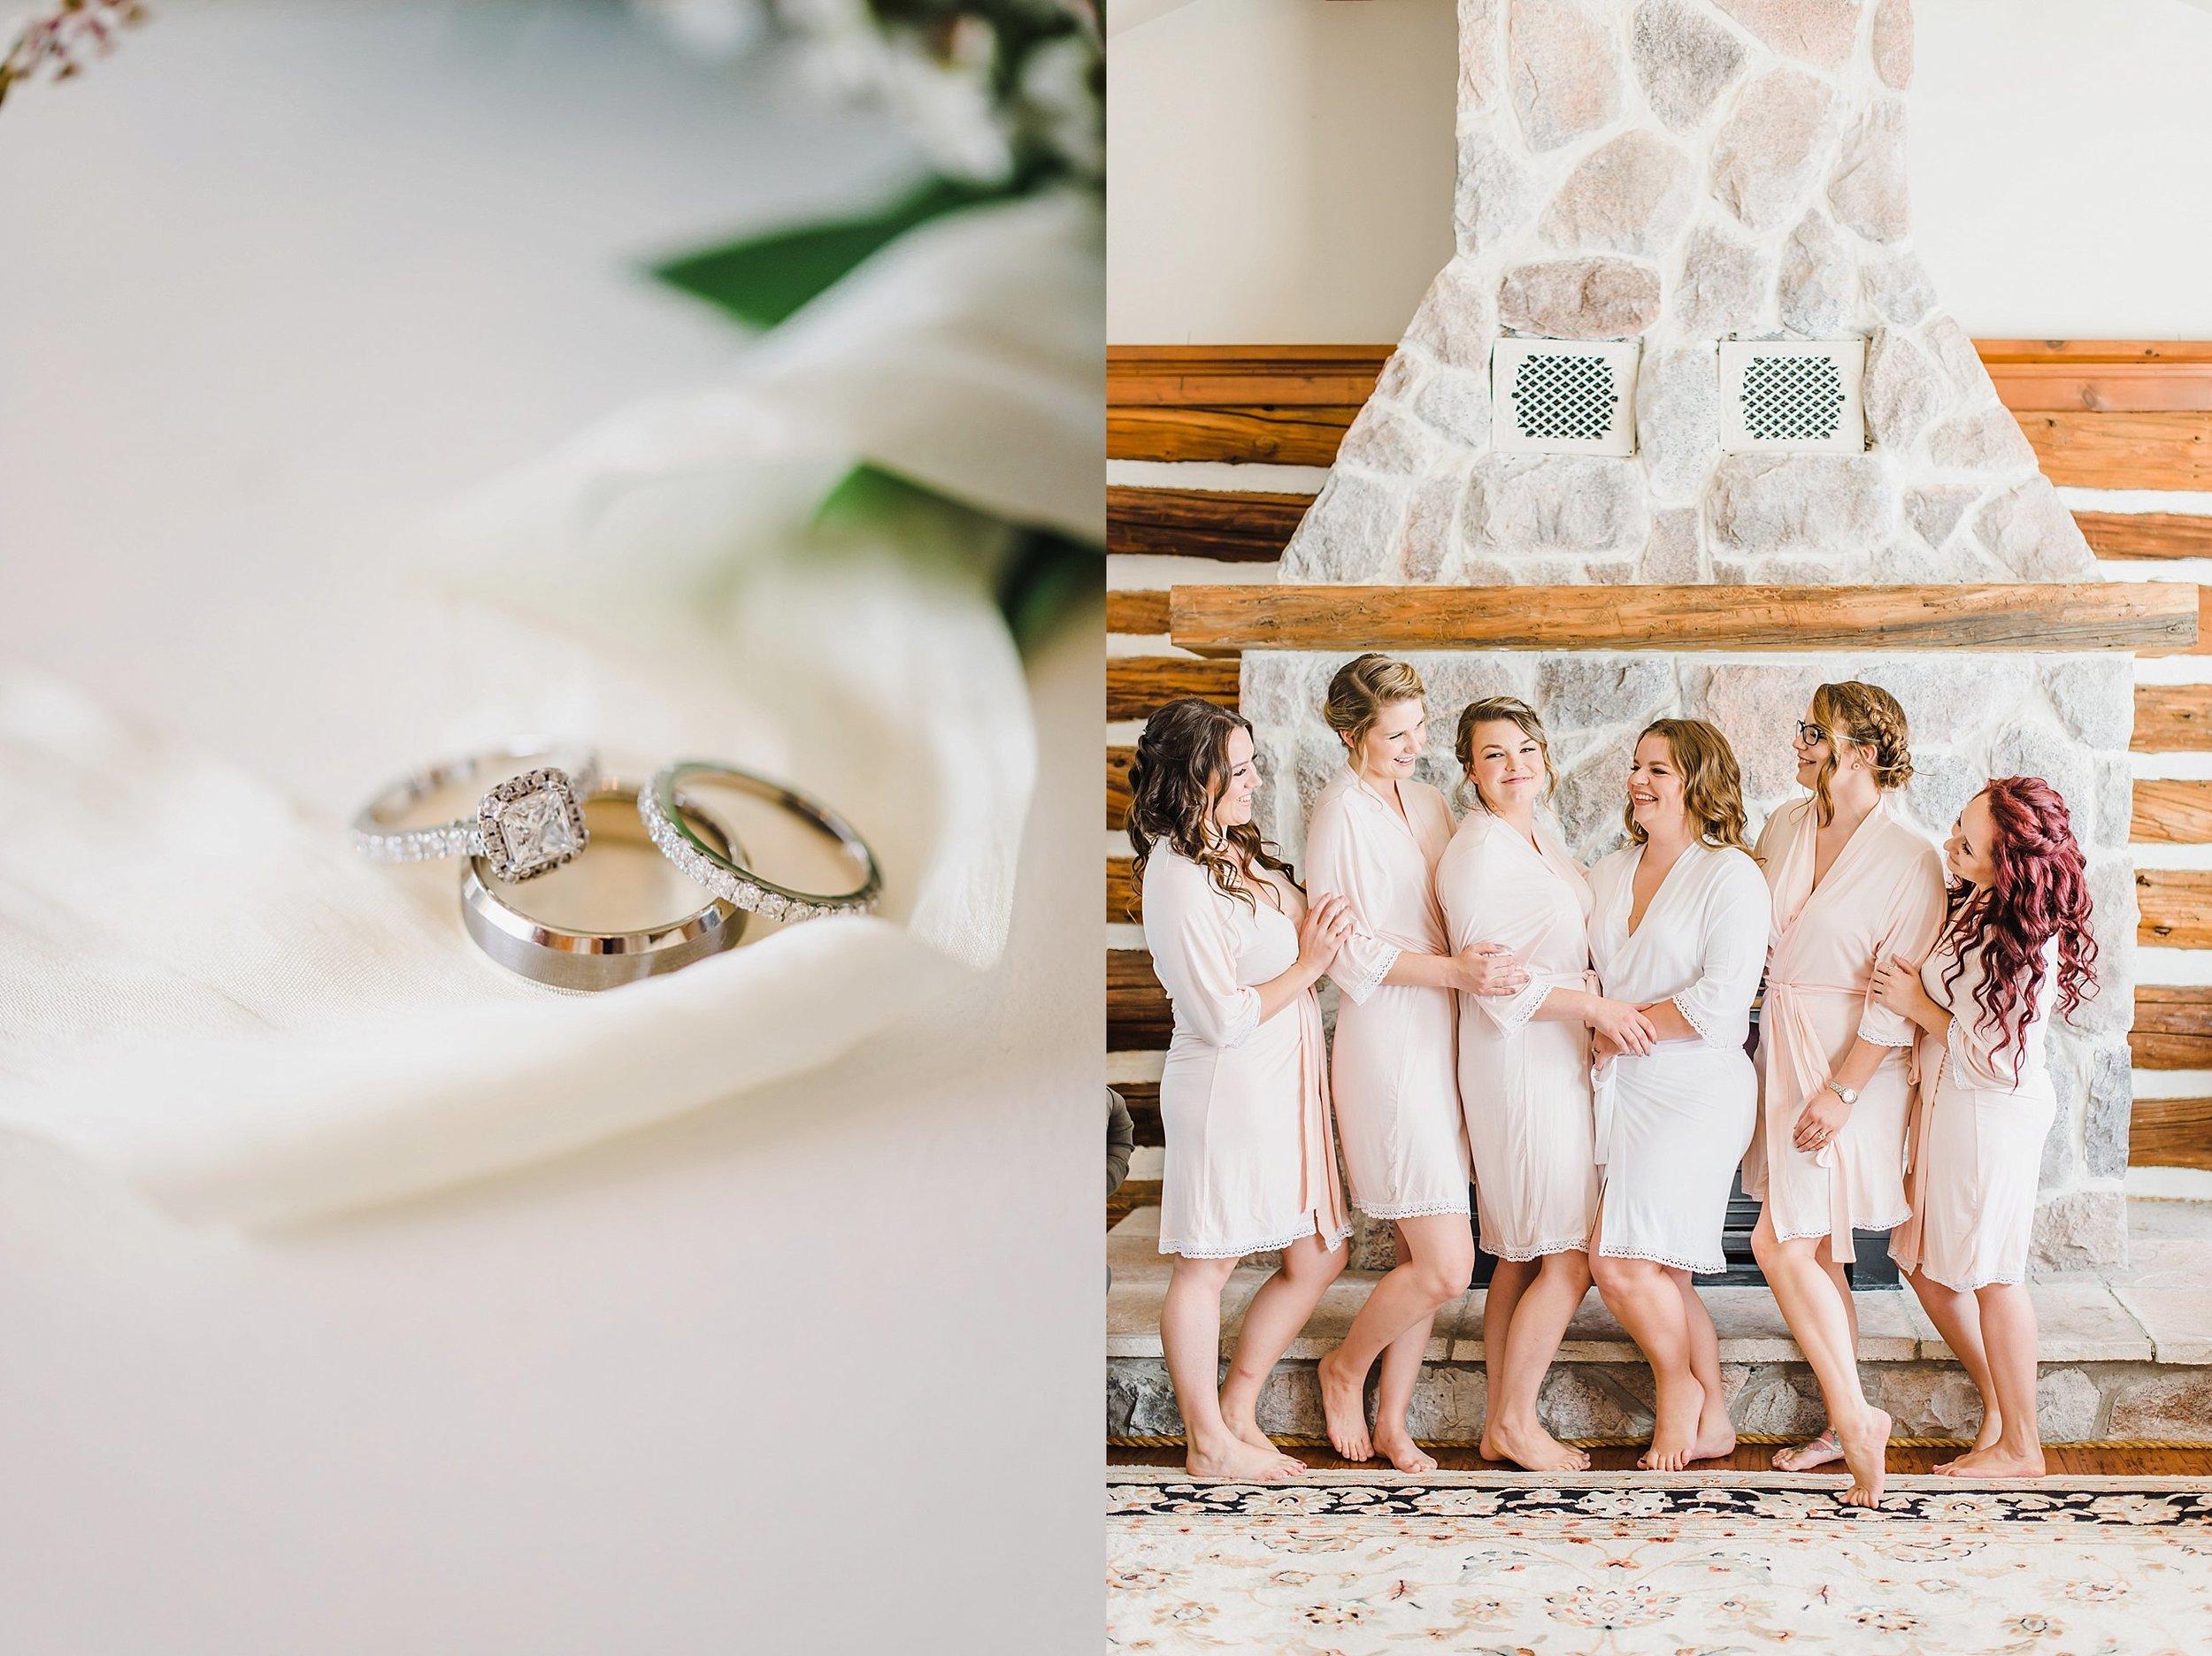 light airy indie fine art ottawa wedding photographer | Ali and Batoul Photography_1063.jpg